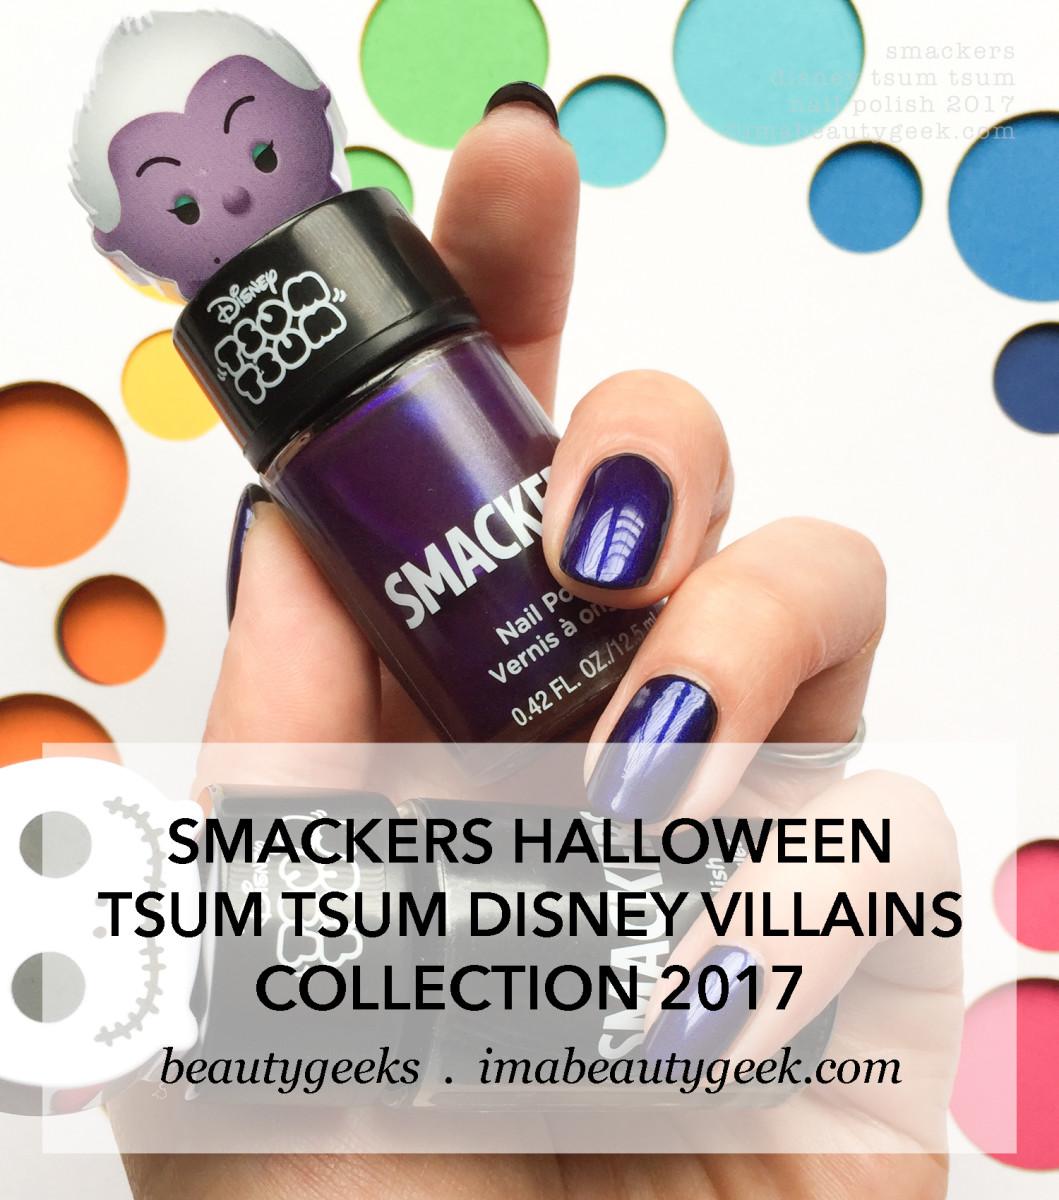 Smackers Halloween Tsum Tsum Disney Villians 2017